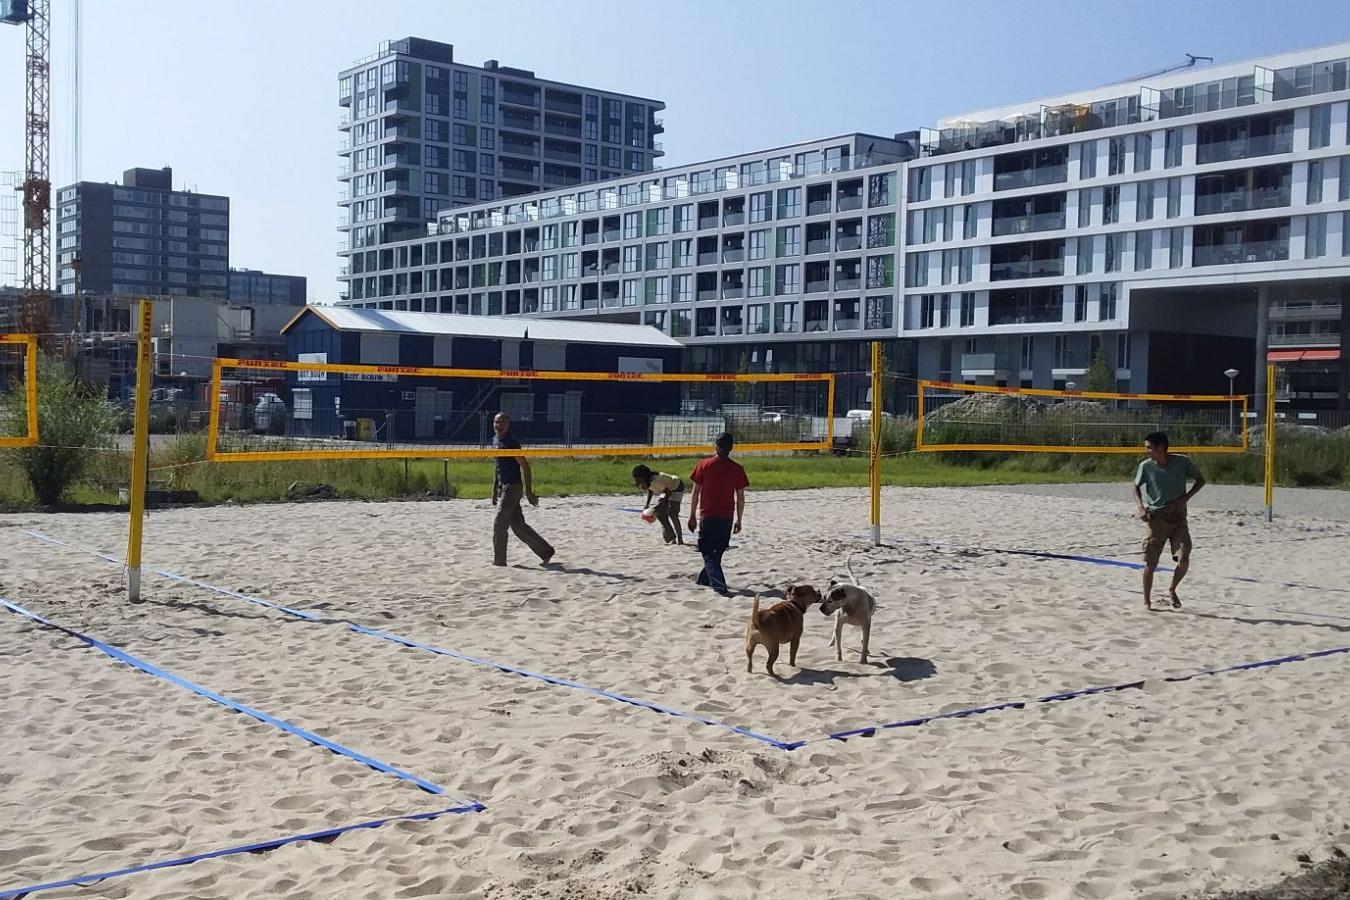 Beach Volleyball_placemaking_kaskantine_placemakingplus_dekey_Communityexpert.jpg